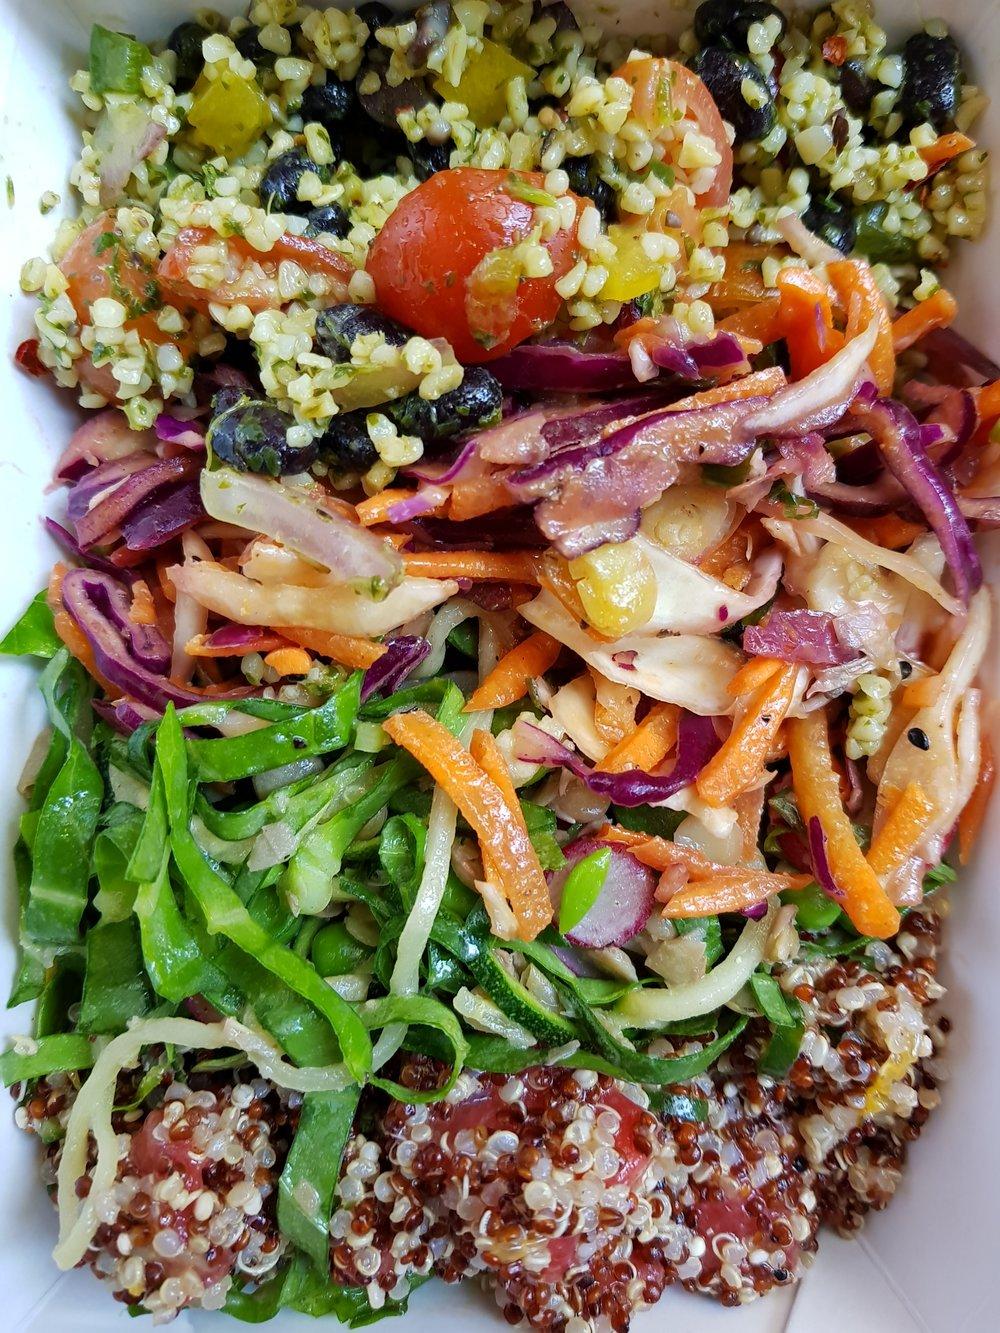 maple-co-kings-cross-london-lunch-box-salad